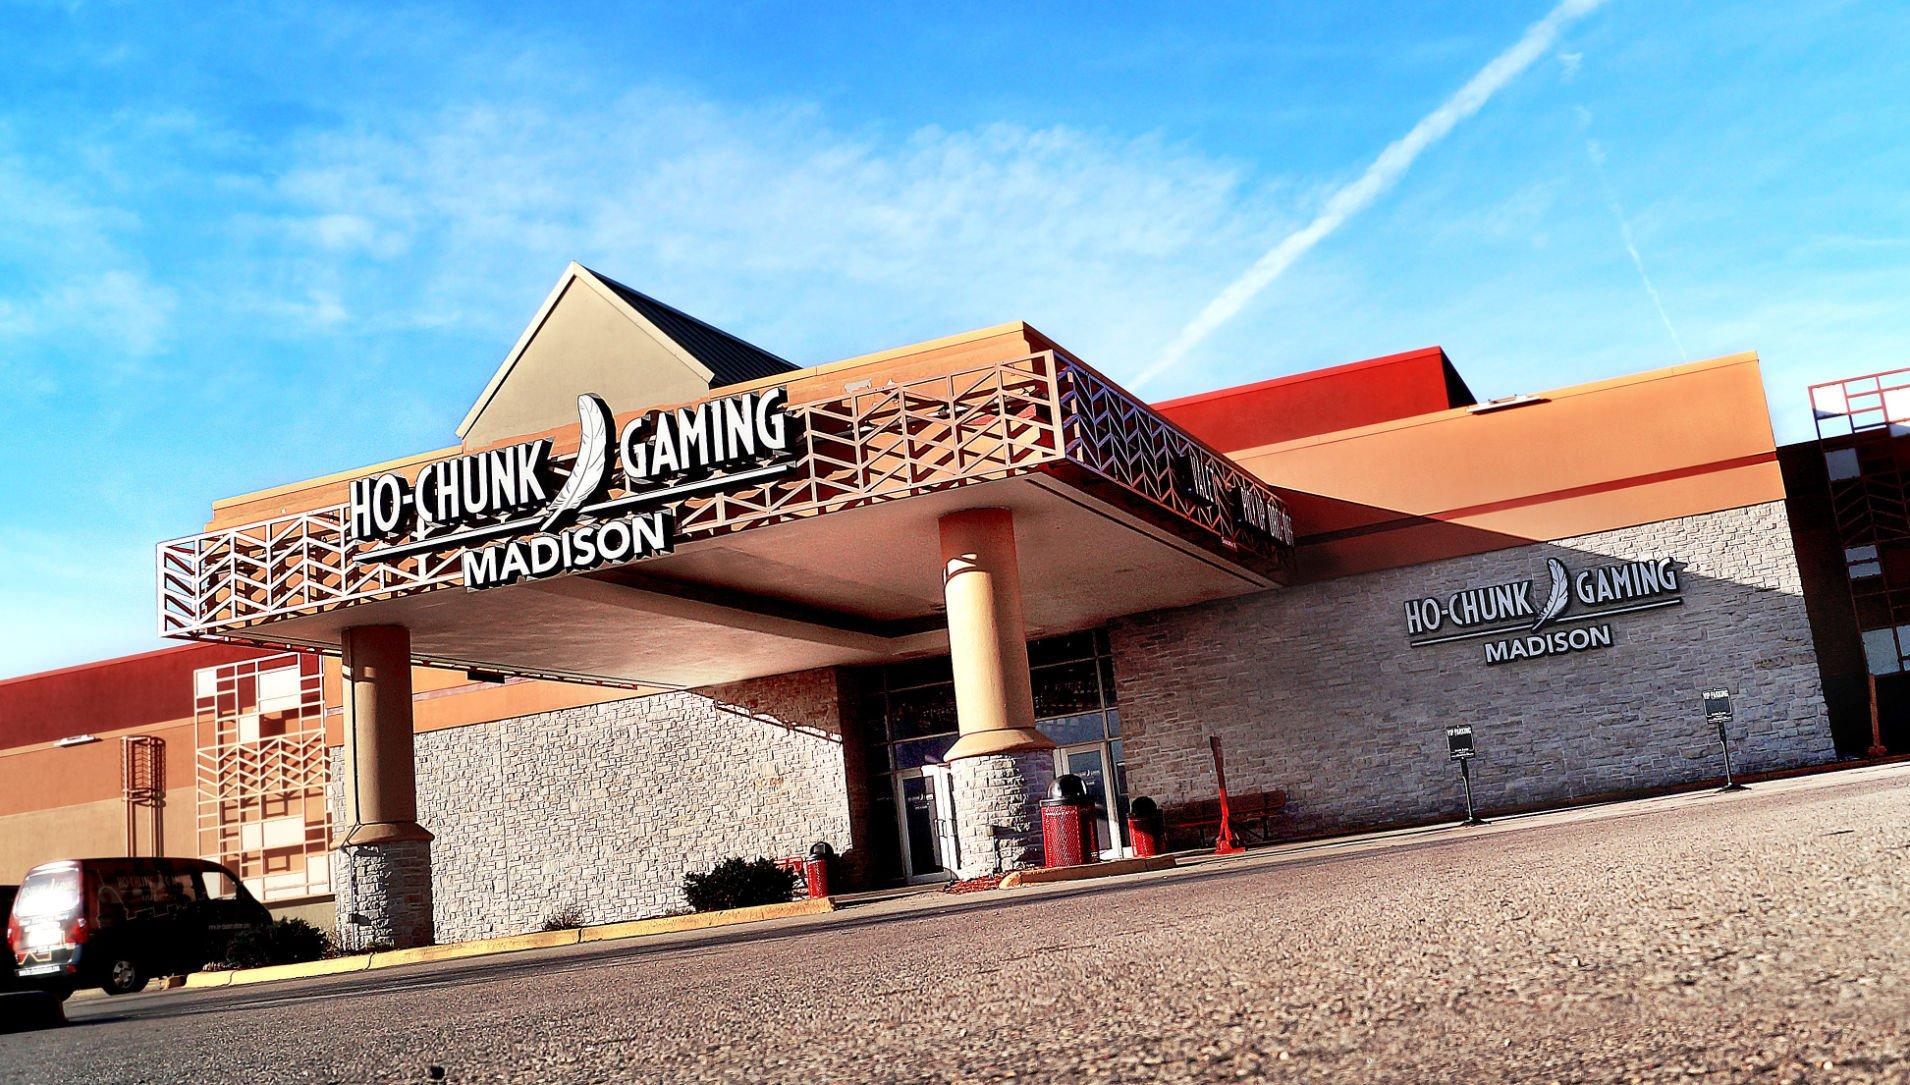 Recent winners at hard rock casino tampa